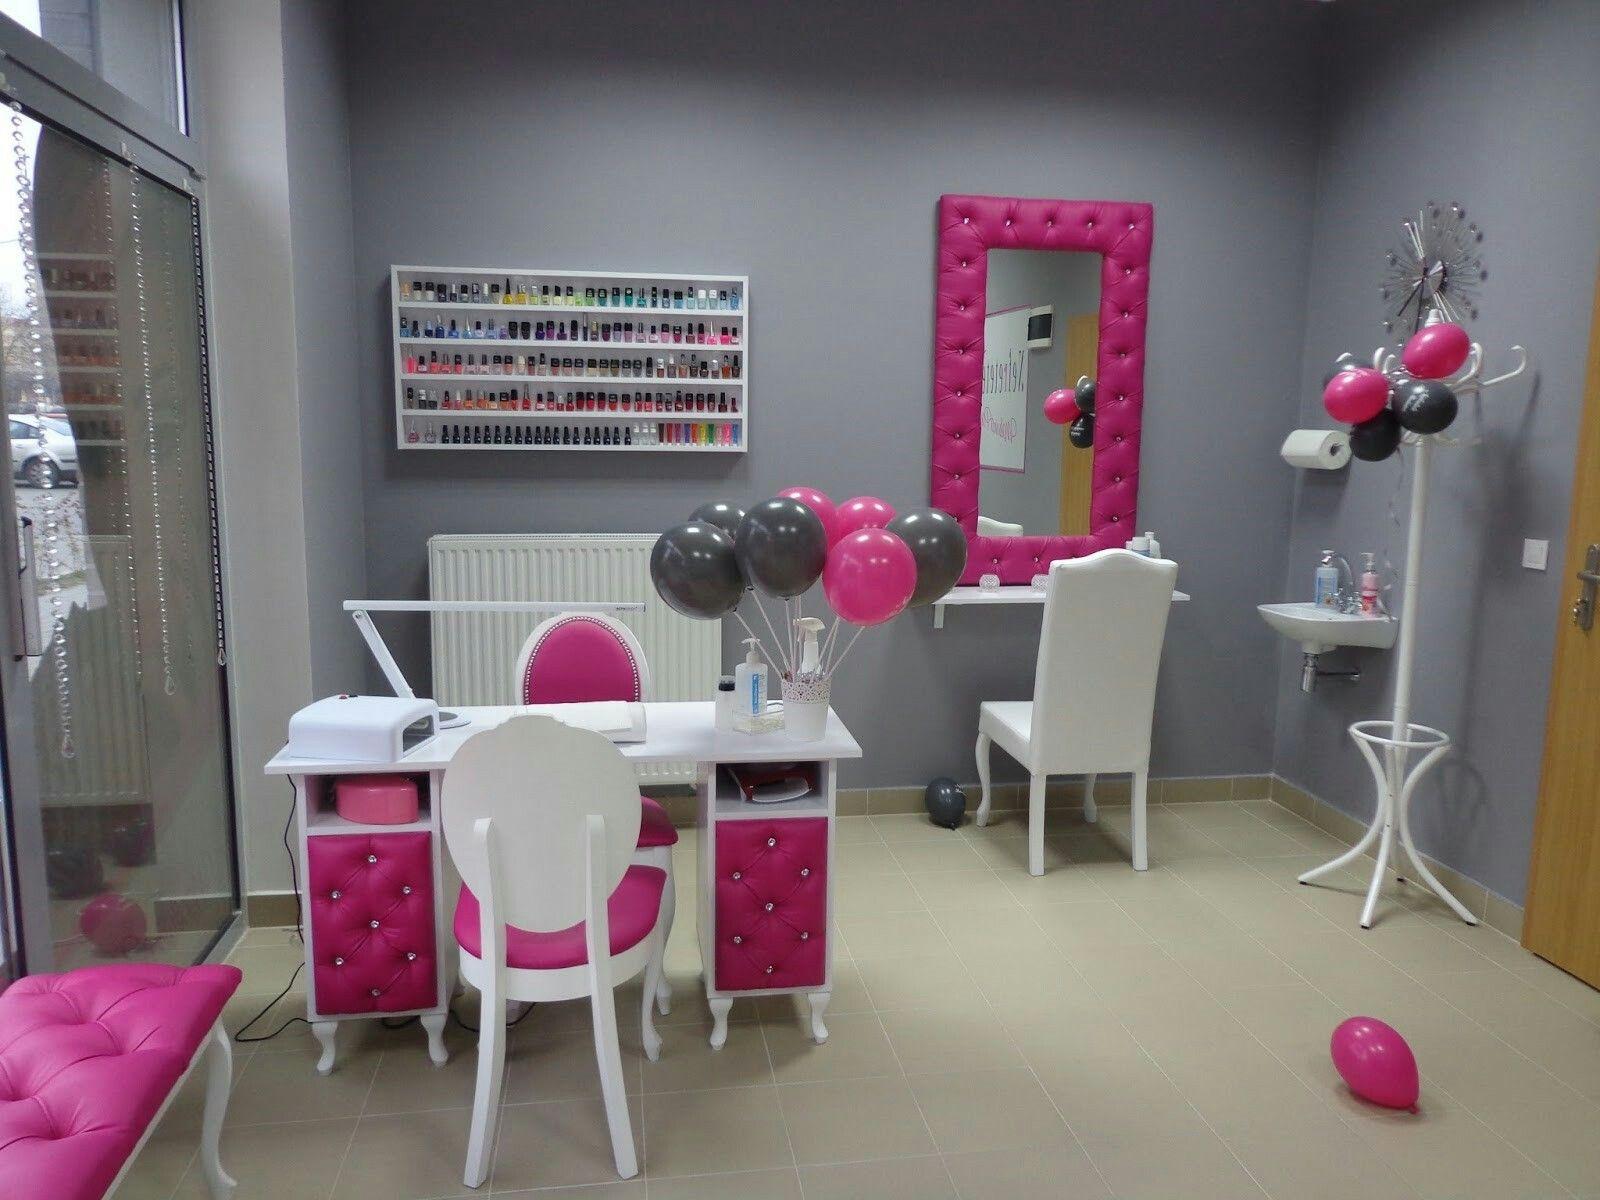 salon de belleza en rosado